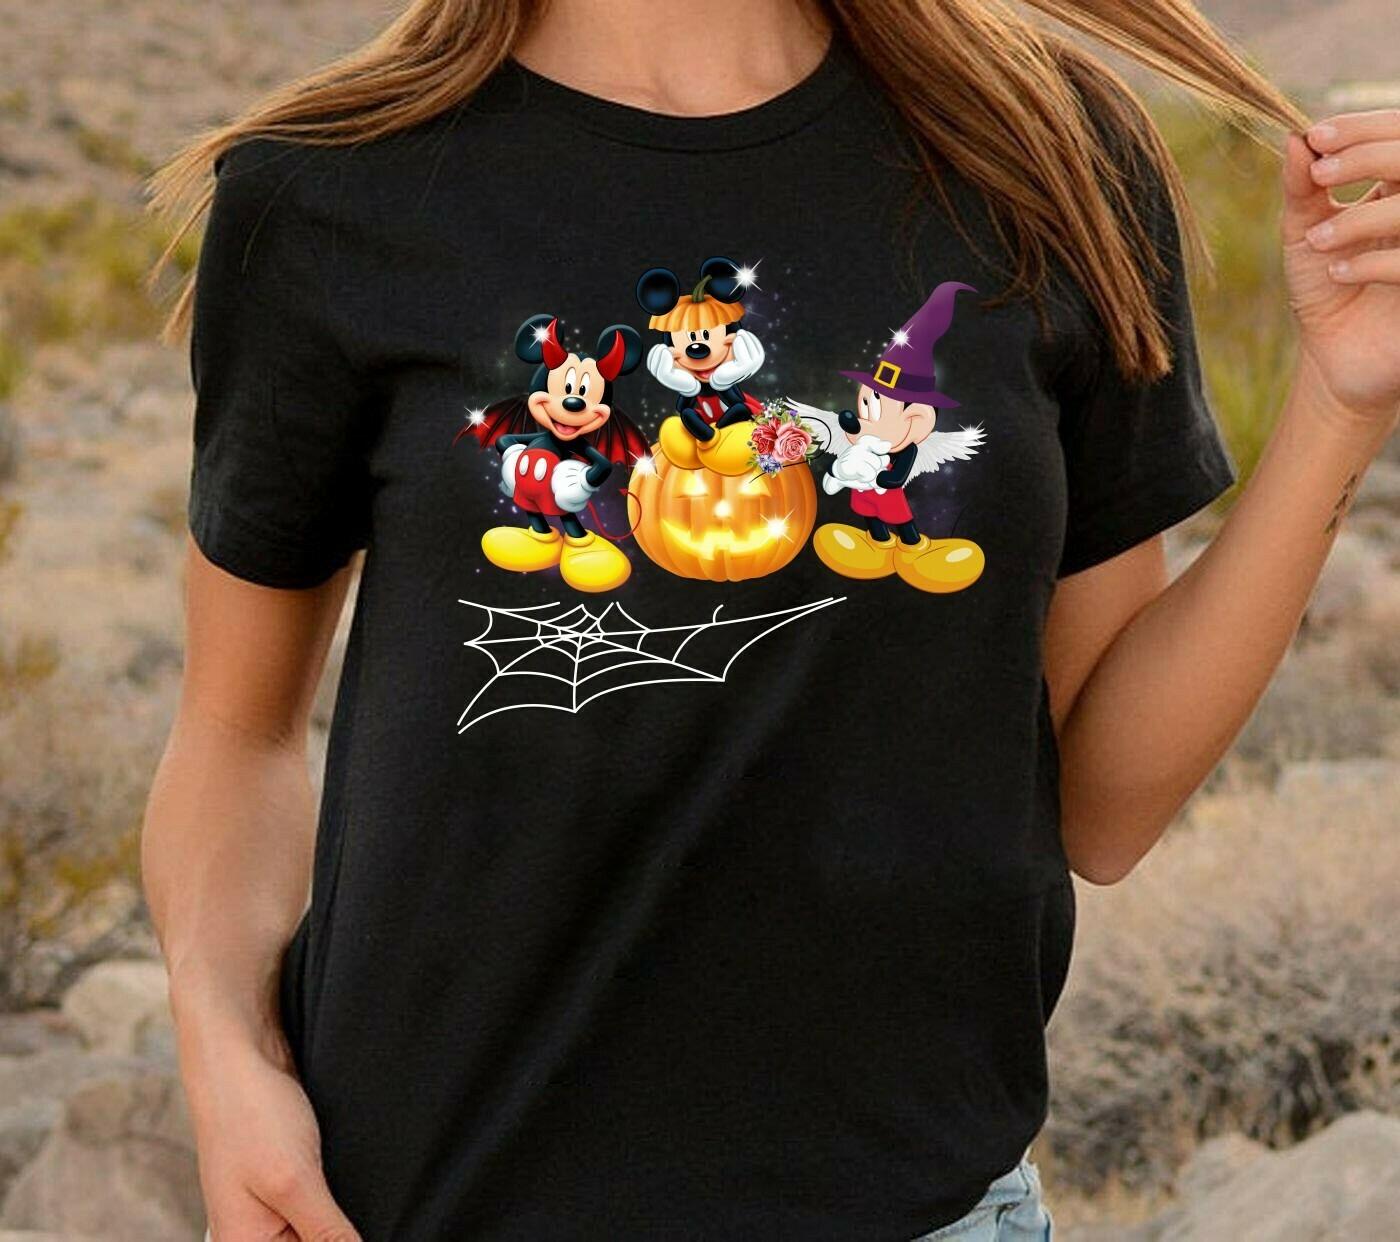 Disney Mickey Witch Vampire Halloween I'm going to Walt Disney Vacation Family Let's Go to Disney World Disneyland Tee Park T-Shirt Long Sleeve Sweatshirt Hoodie Jolly Family Gifts